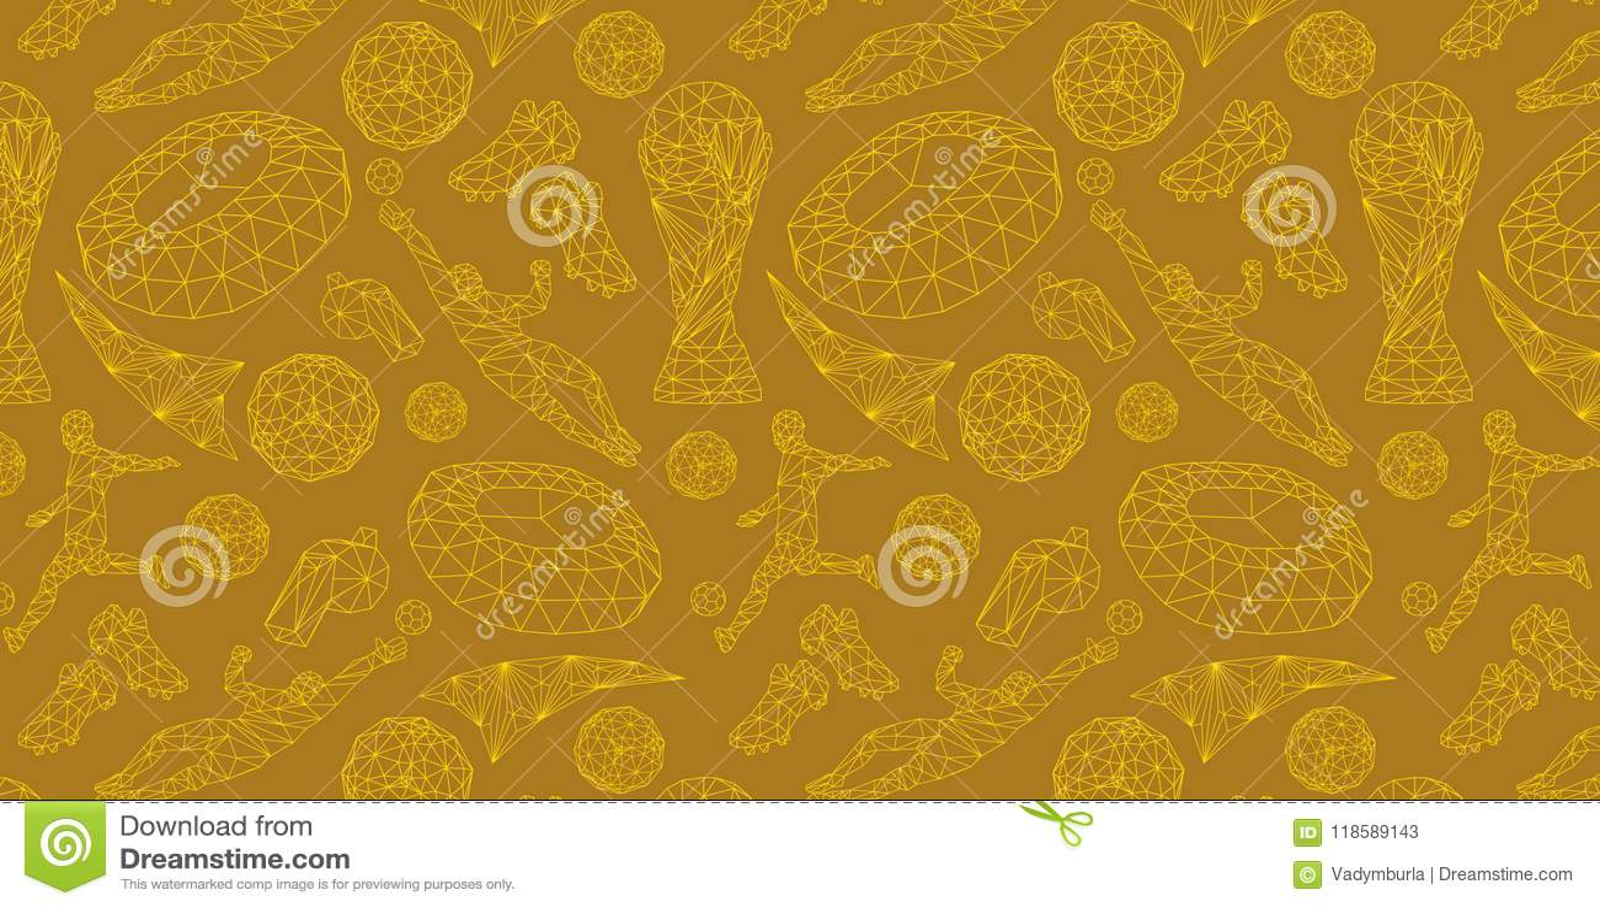 Wallpaper Background Pattern Soccer Stock Illustration